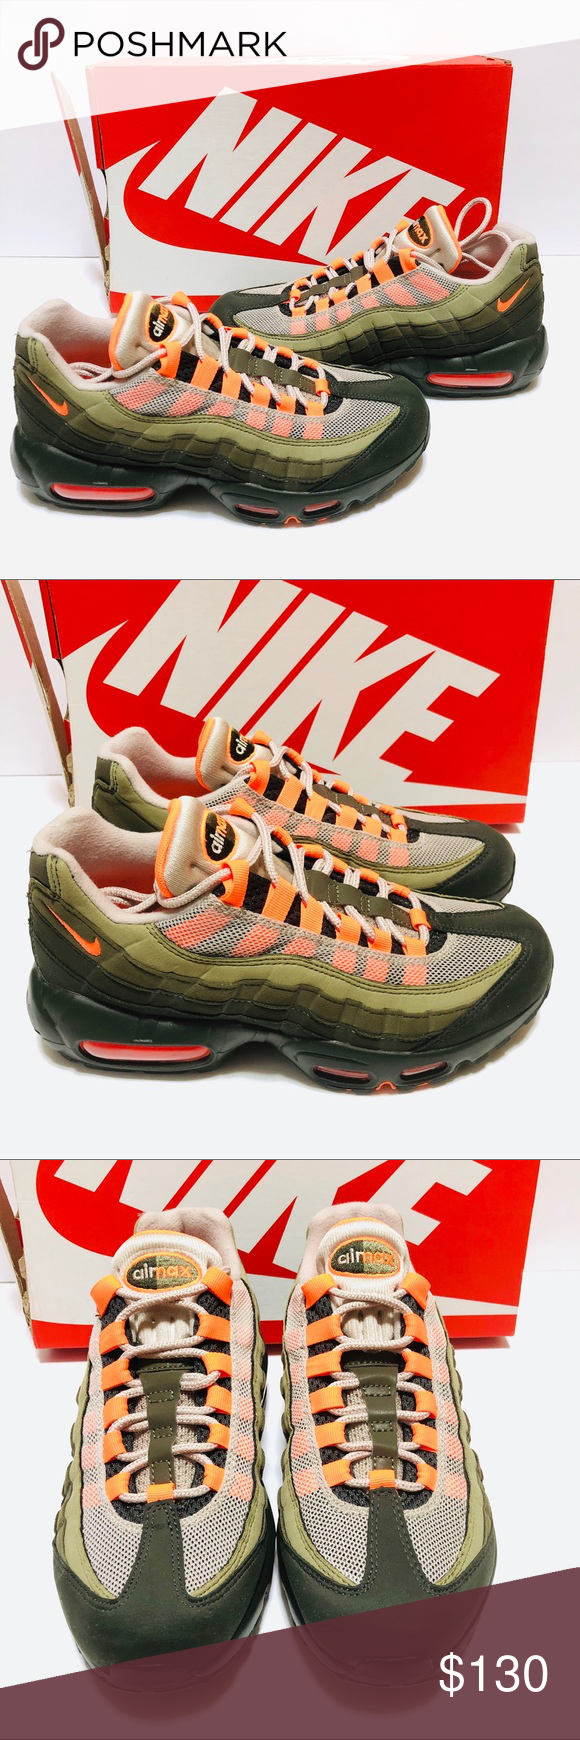 orange and green air max 95